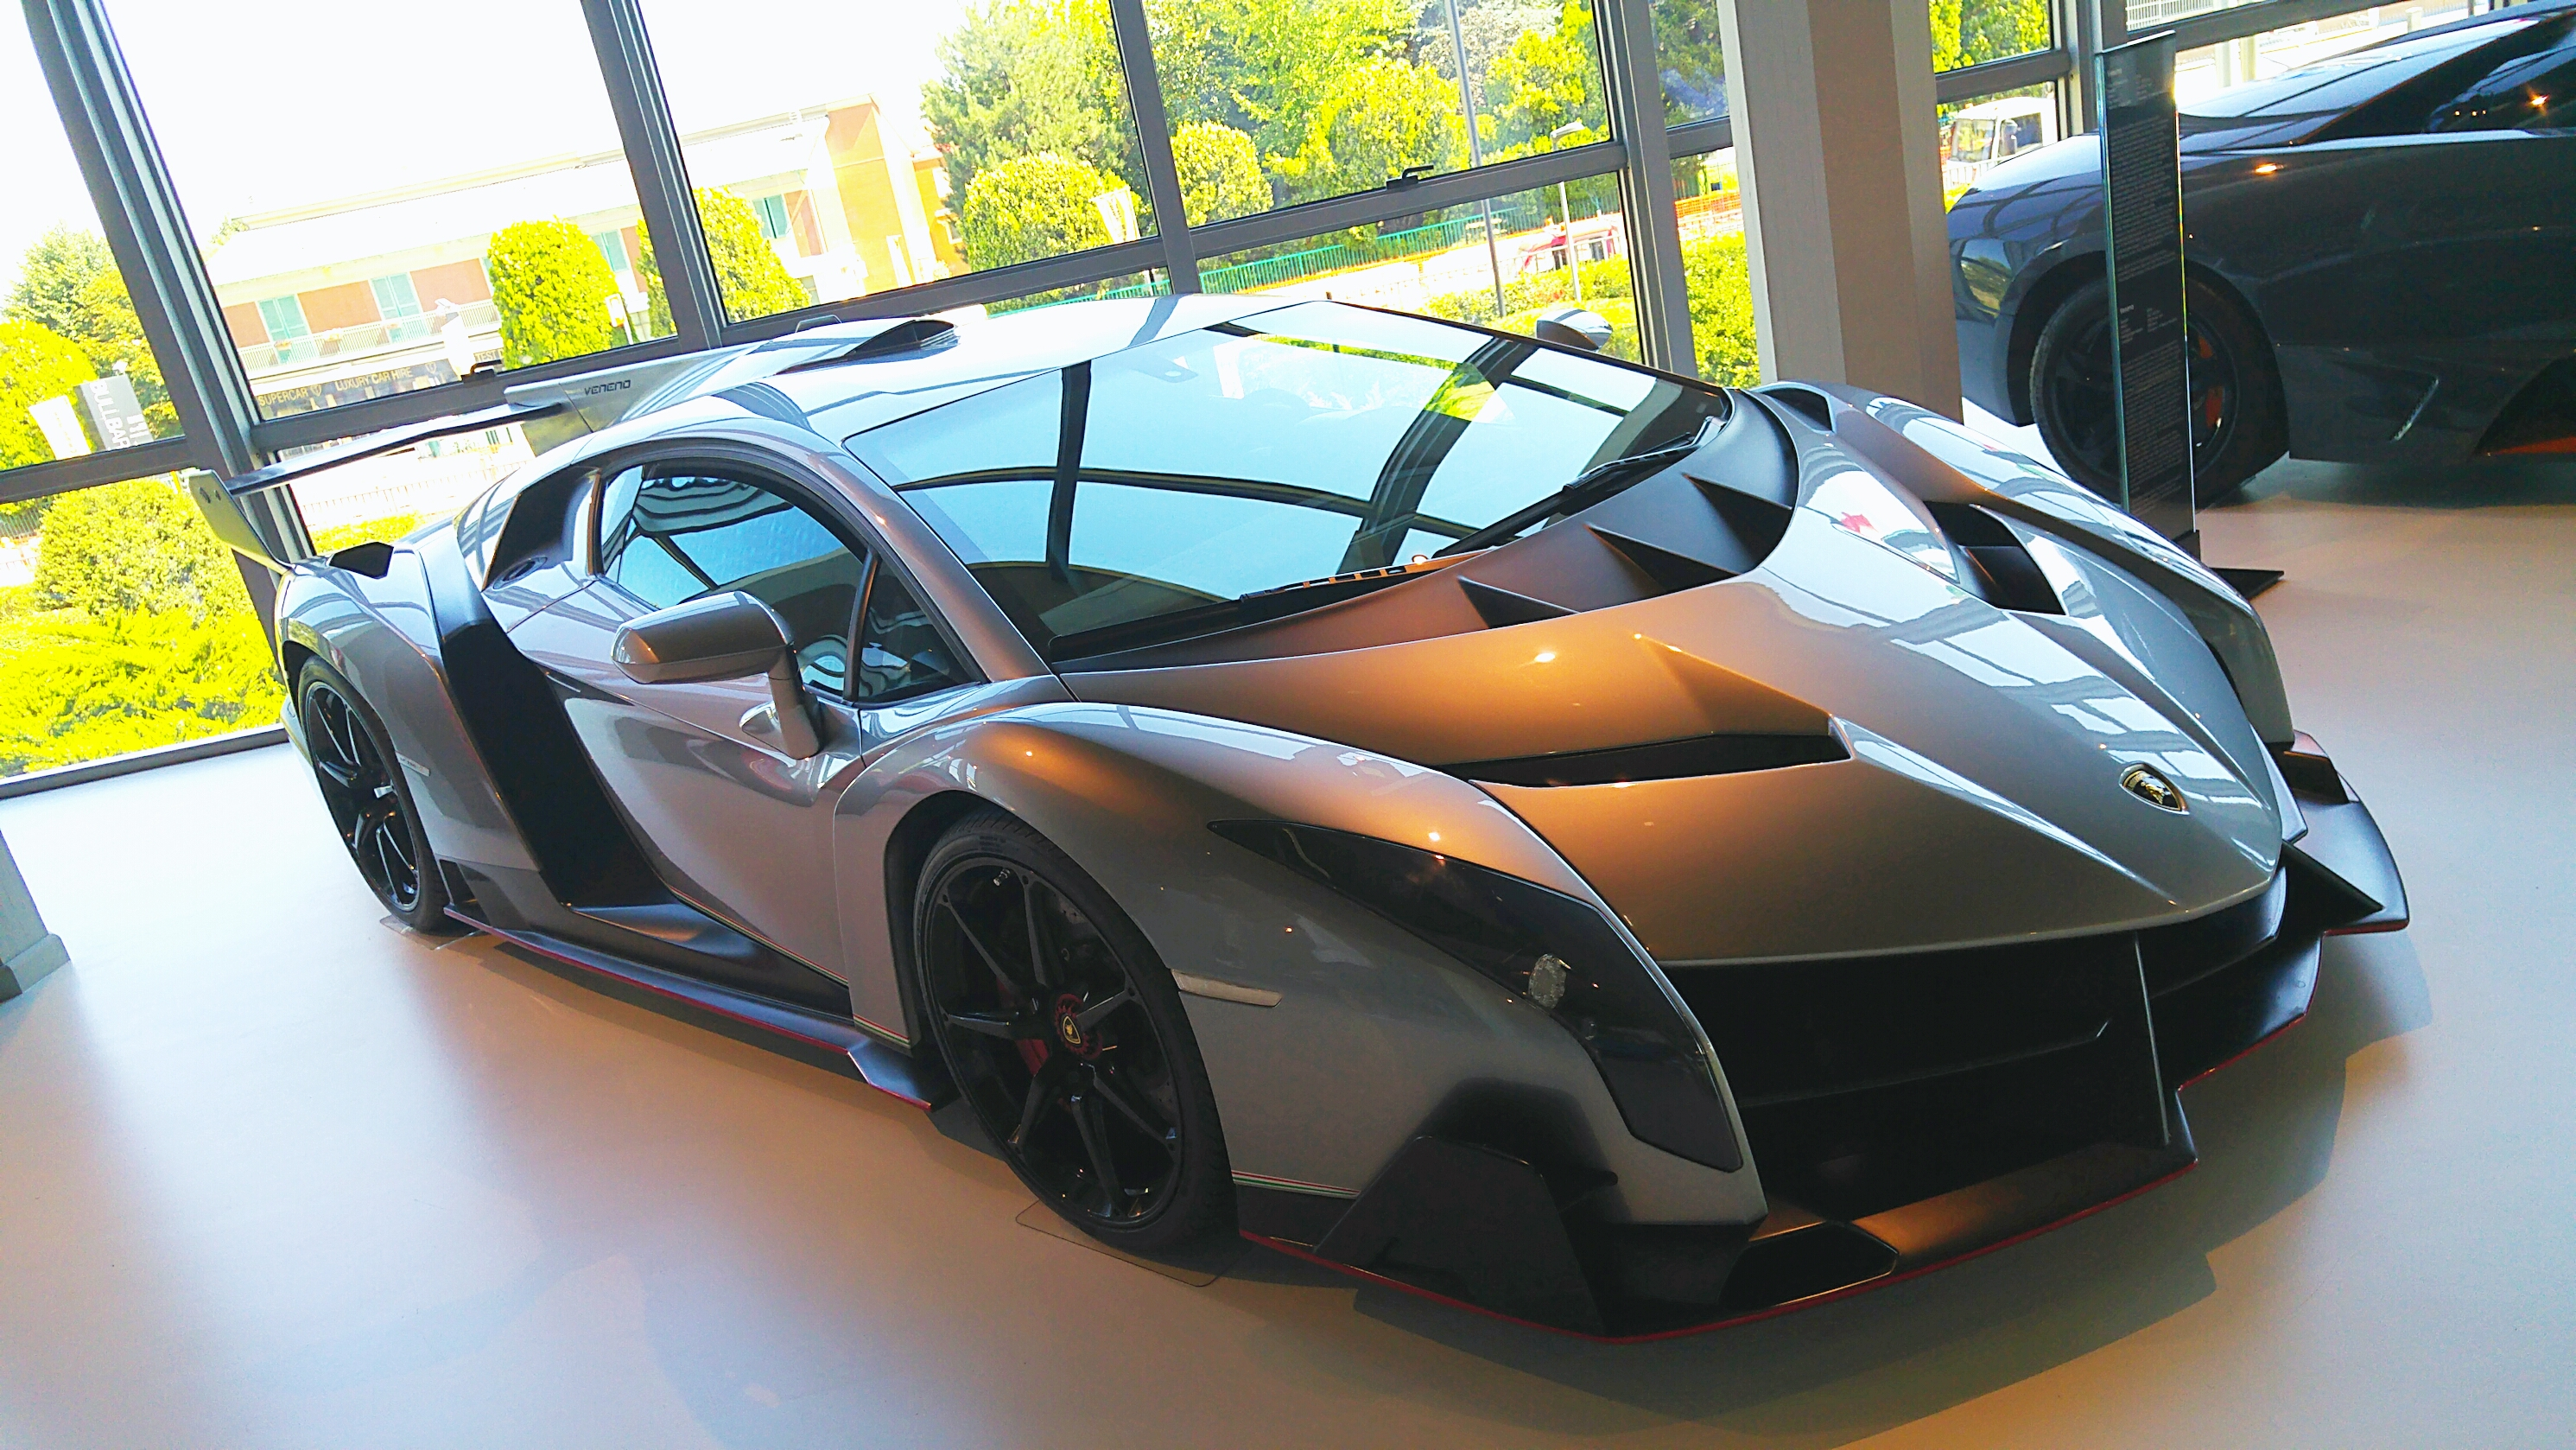 File:Lamborghini Veneno.jpg - Wikimedia Commons